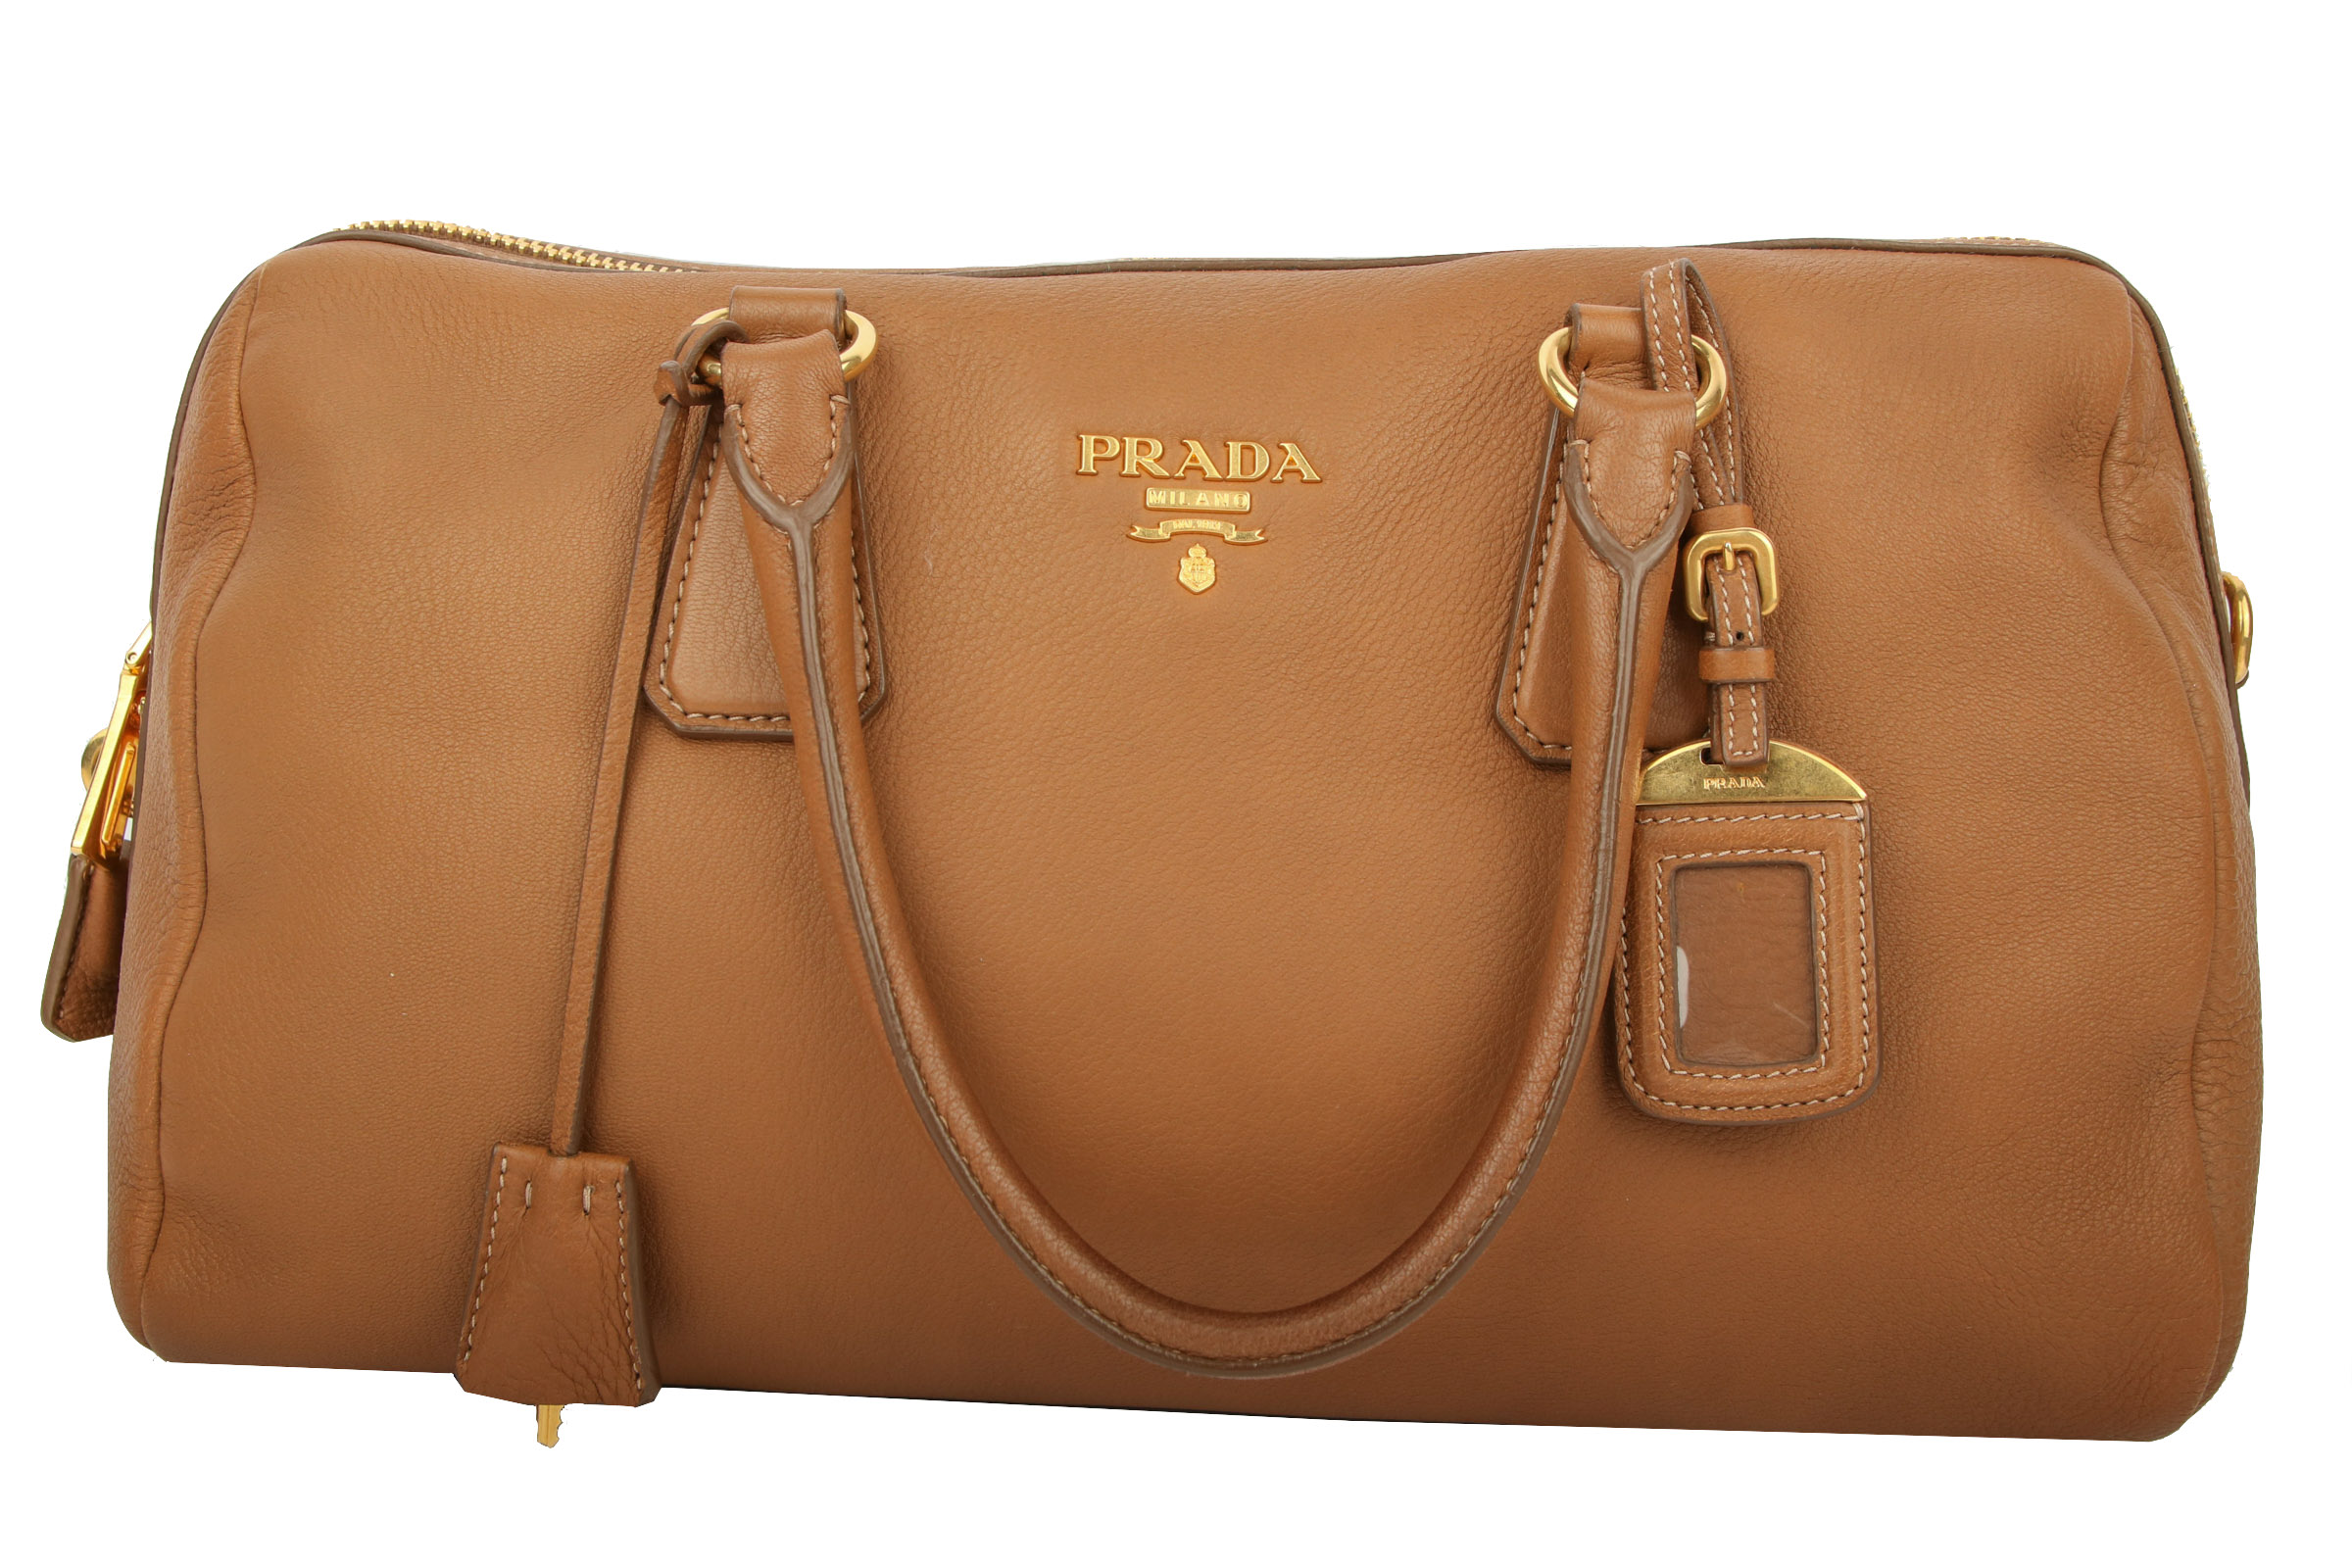 740b3c1b74 Prada Handbags & Accessories   Luxussachen.com